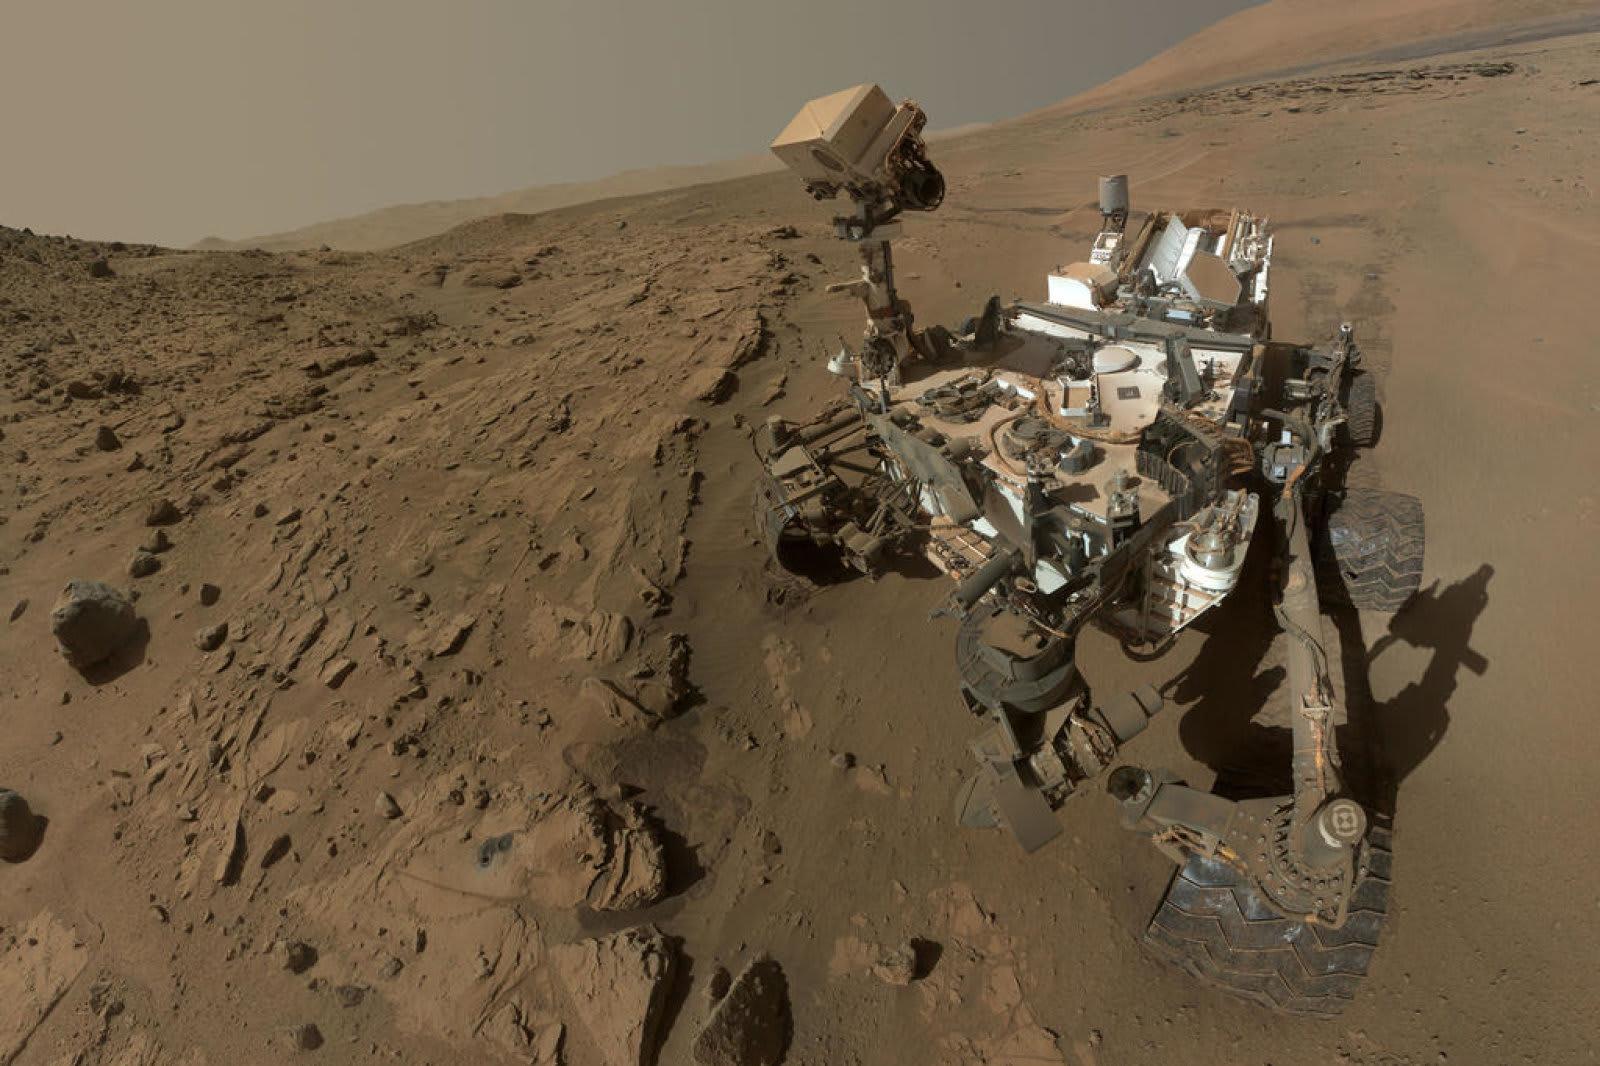 NASA/JPL-Caltech/MSSS via Getty Images